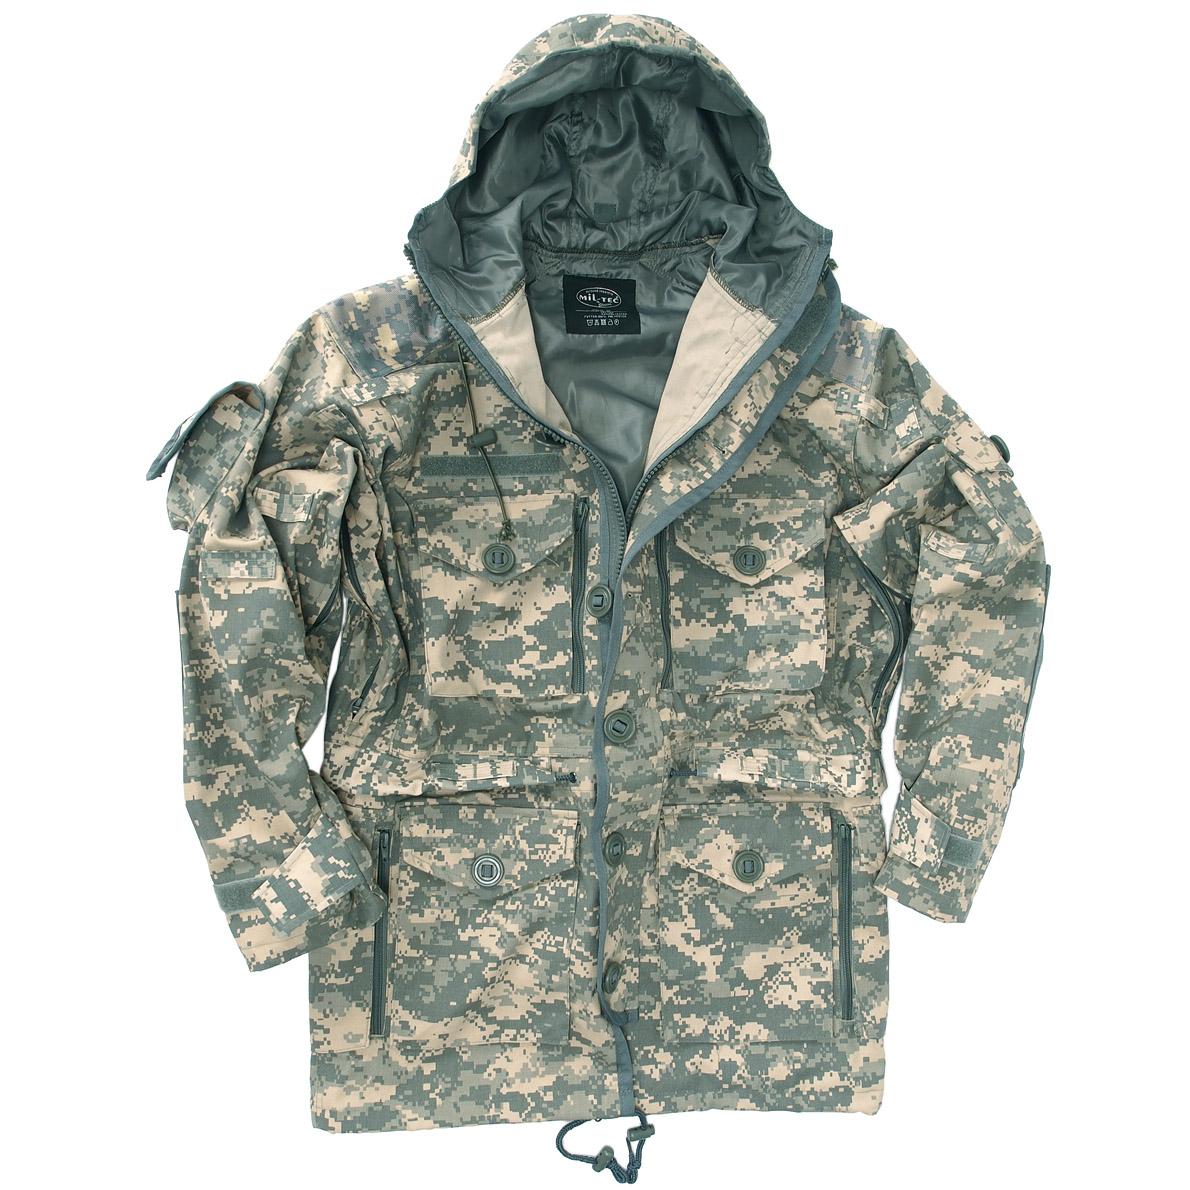 mil tec tactical military smock army parka hunting mens jacket acu digital camo ebay. Black Bedroom Furniture Sets. Home Design Ideas